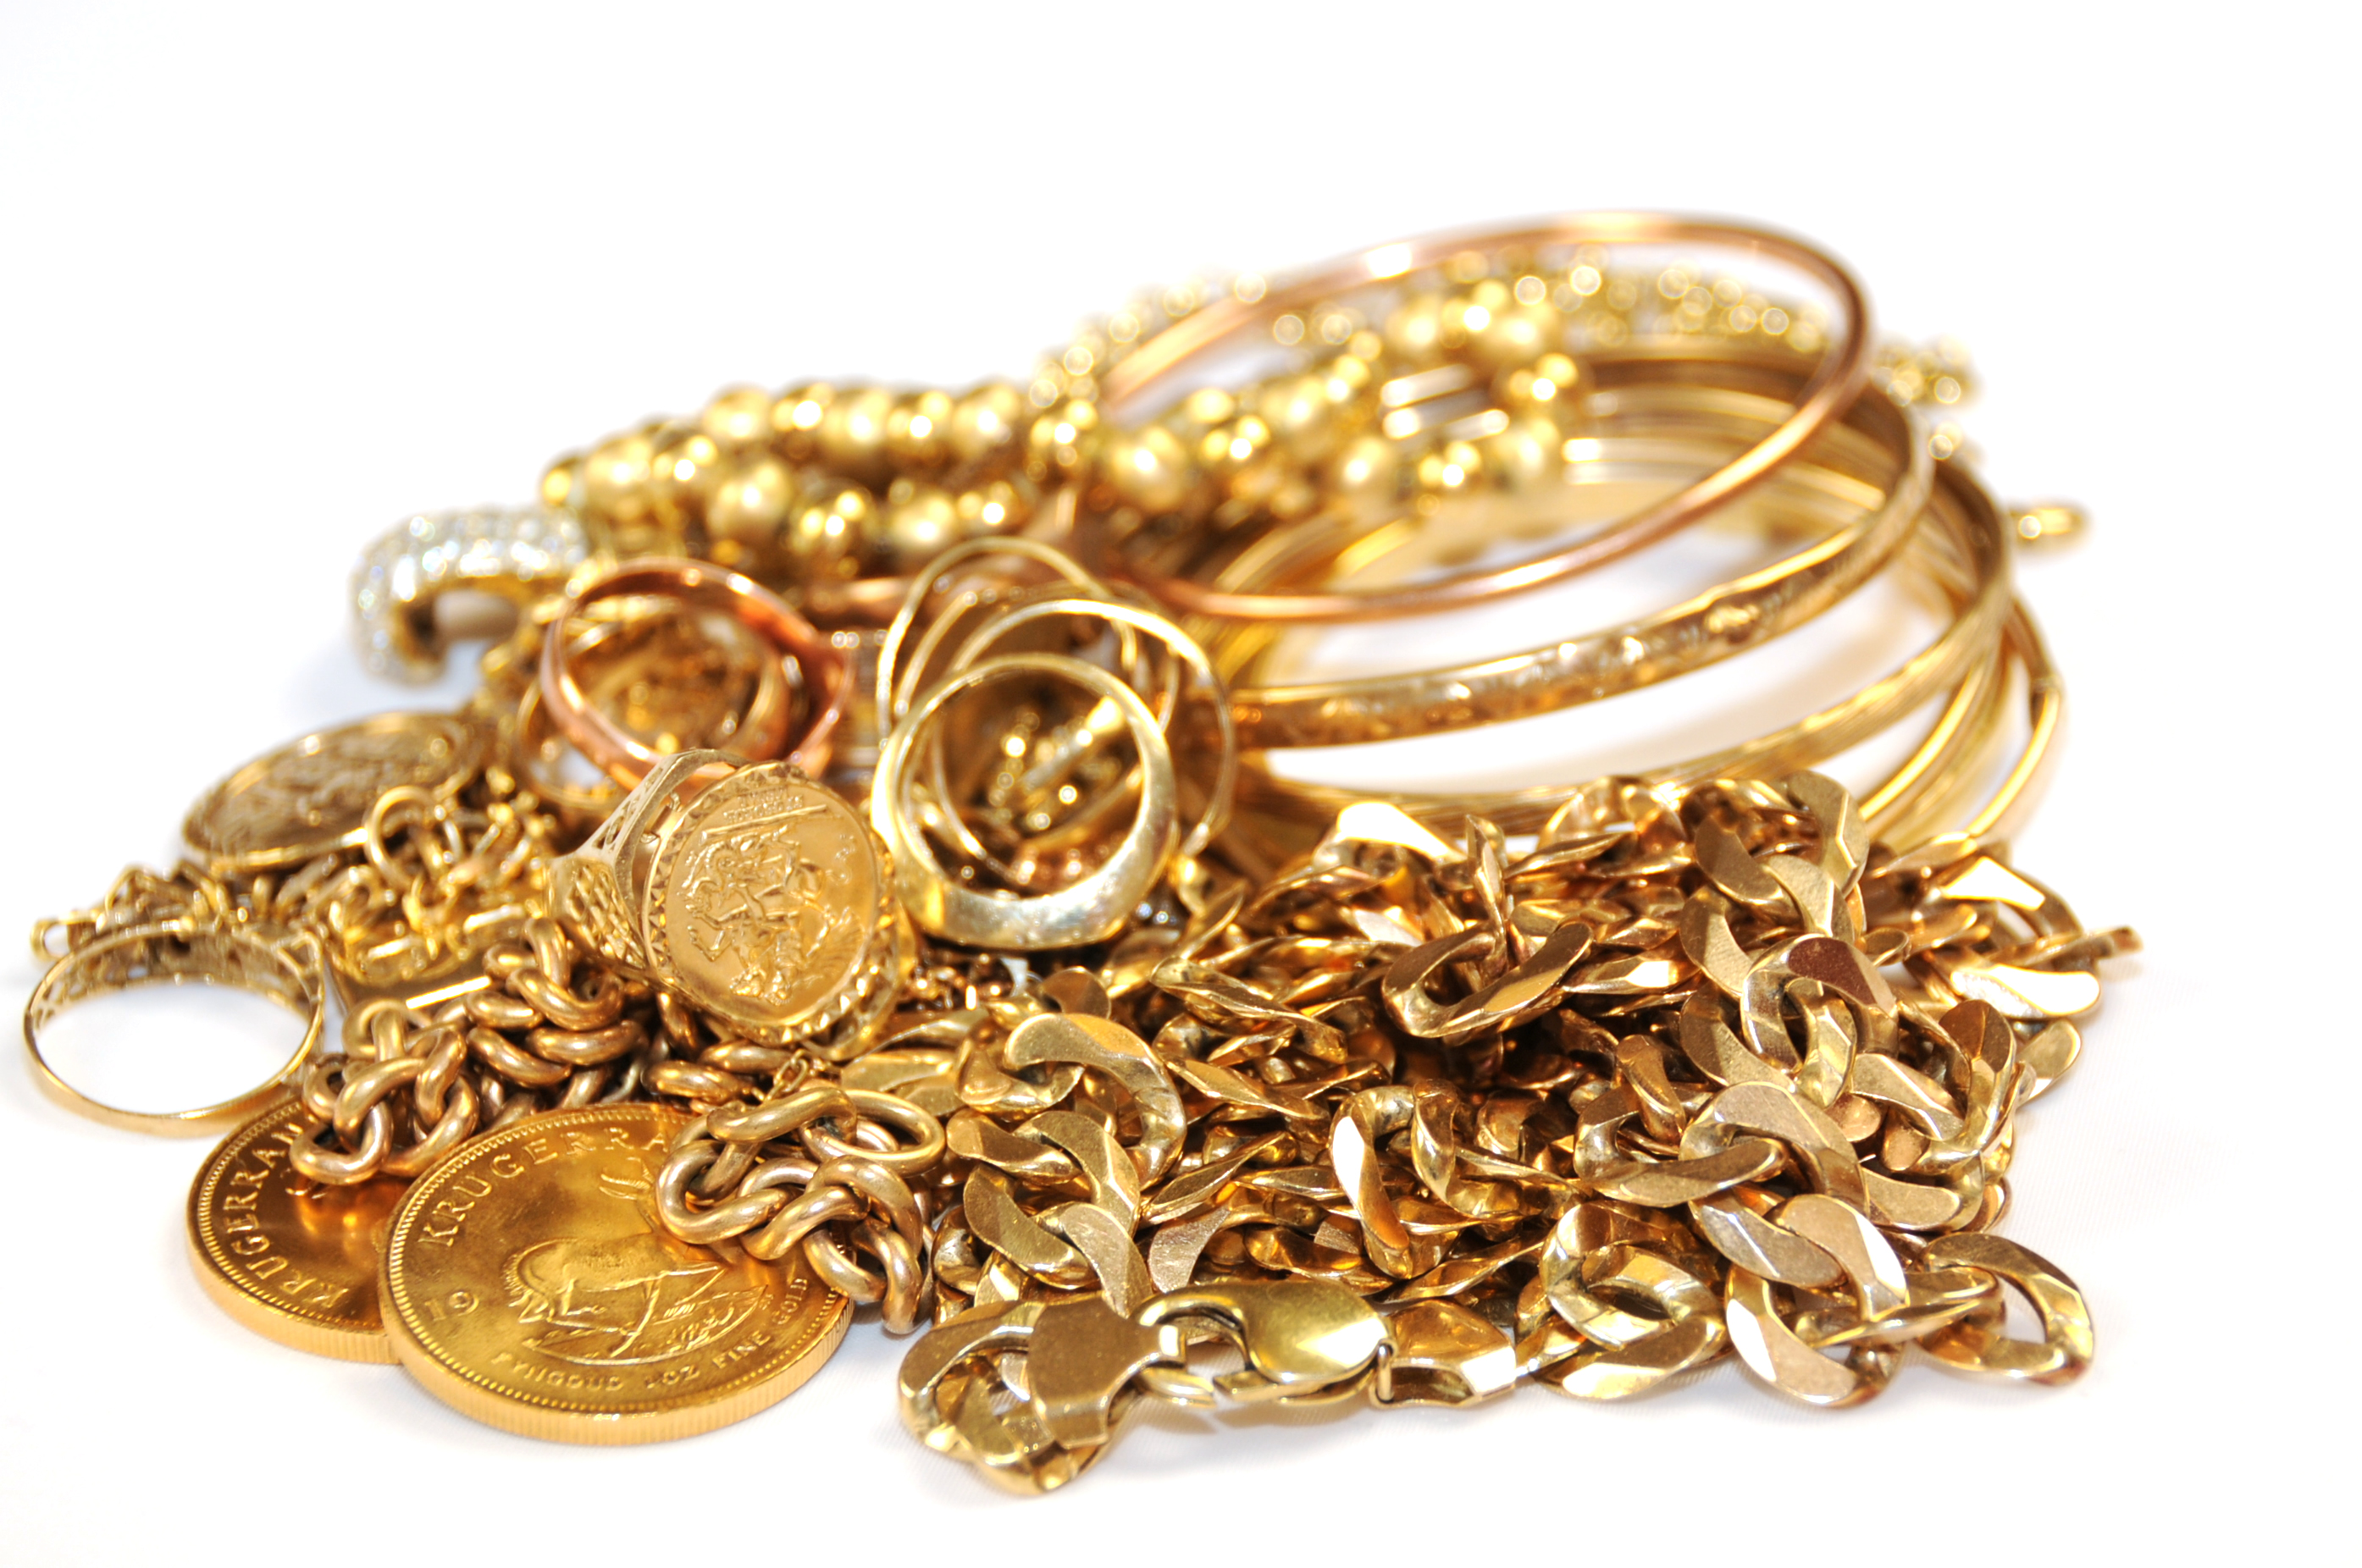 Compro Joias de Ouro